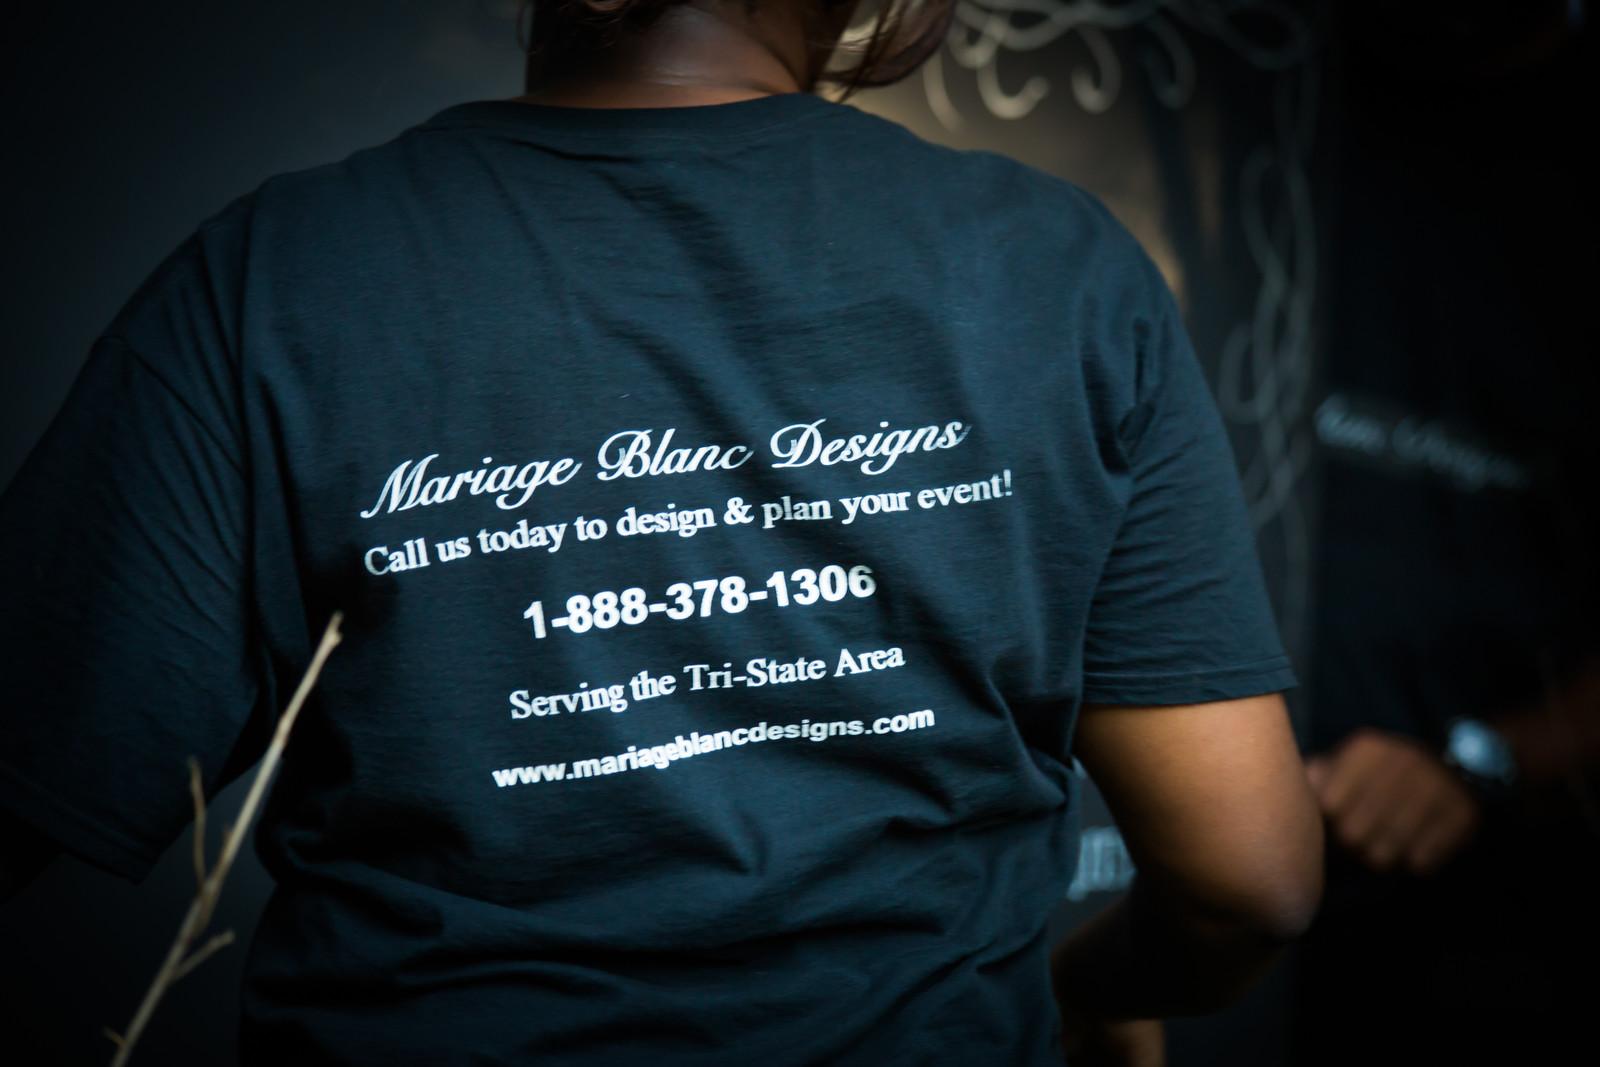 Mariage Blanc Designs Team